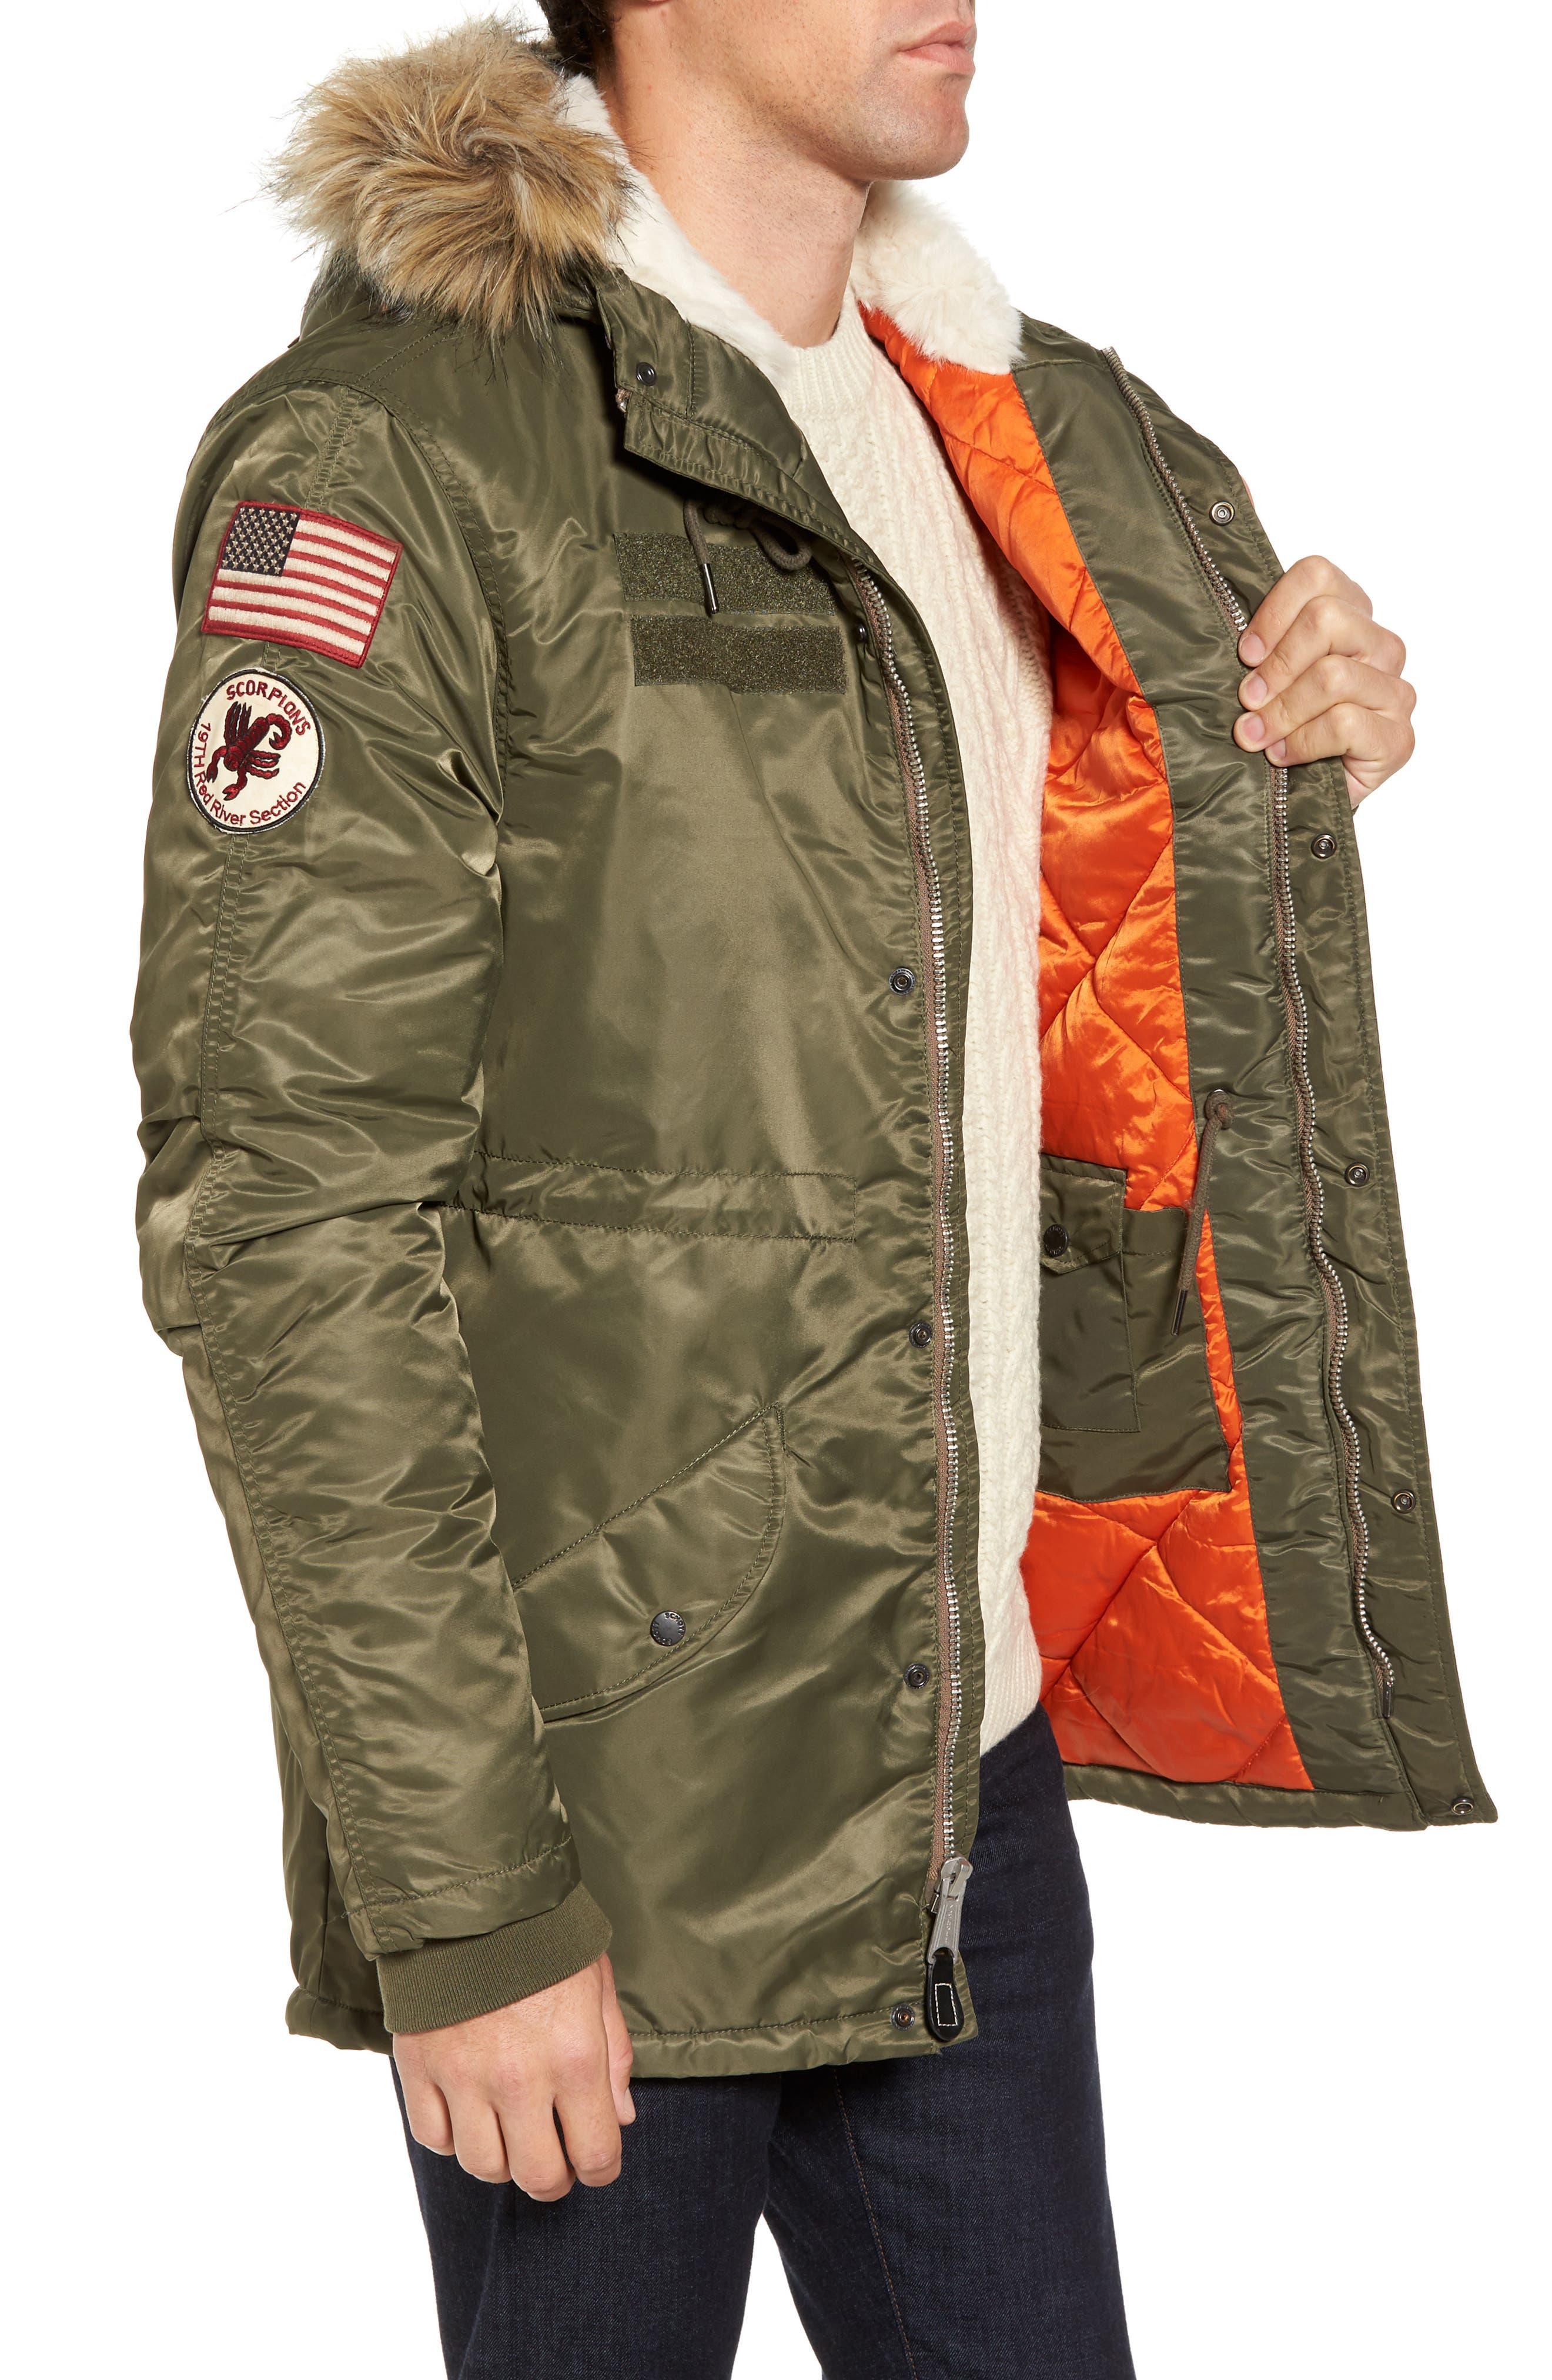 N3-B Snorkel Flight Jacket with Faux Fur Trim & Lining,                             Alternate thumbnail 6, color,